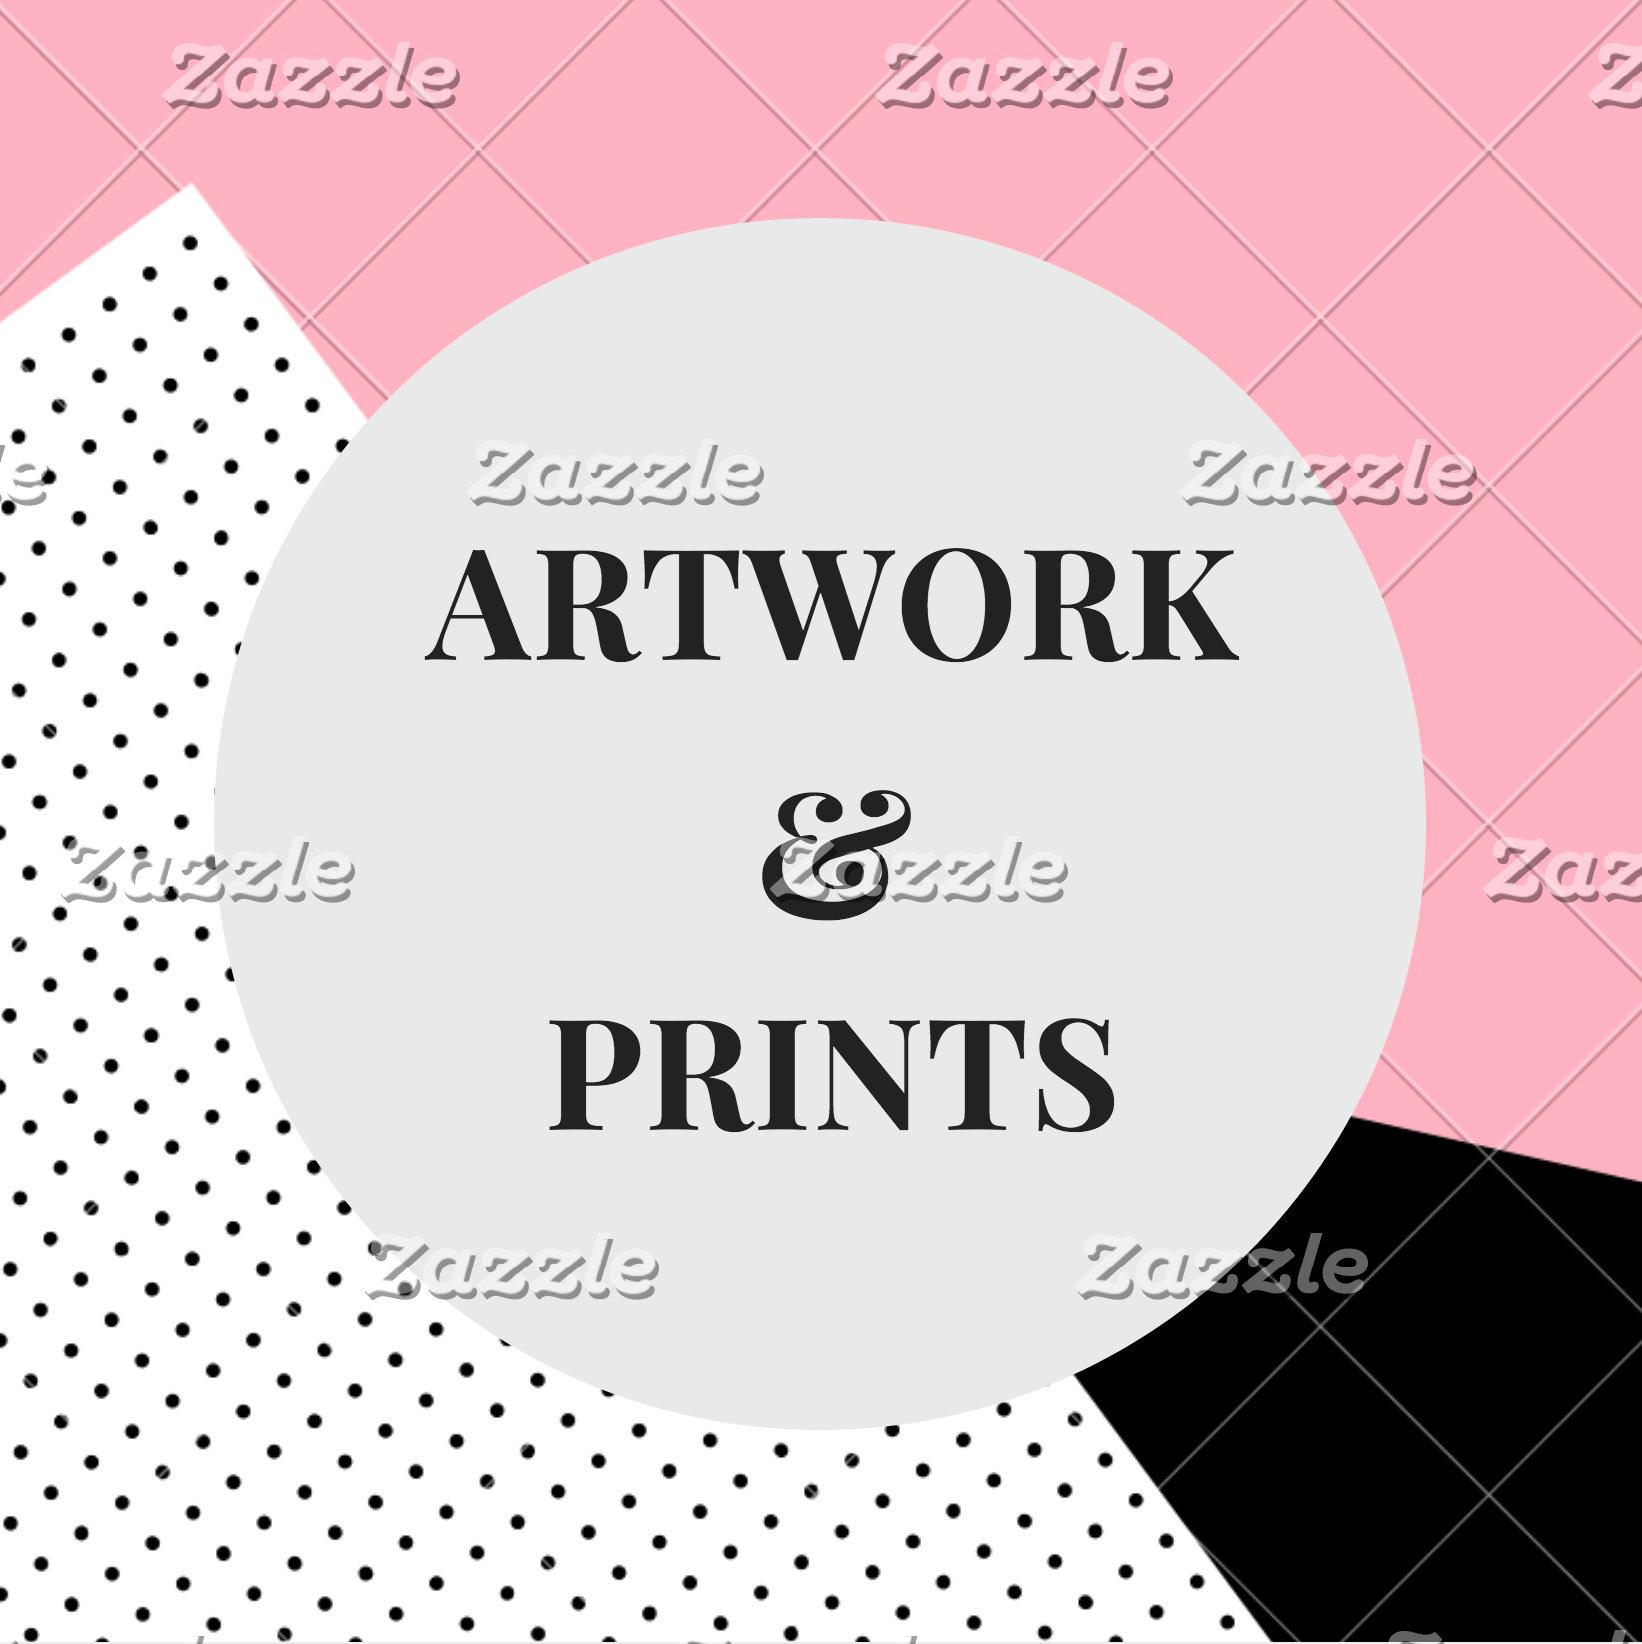 Artwork & Prints